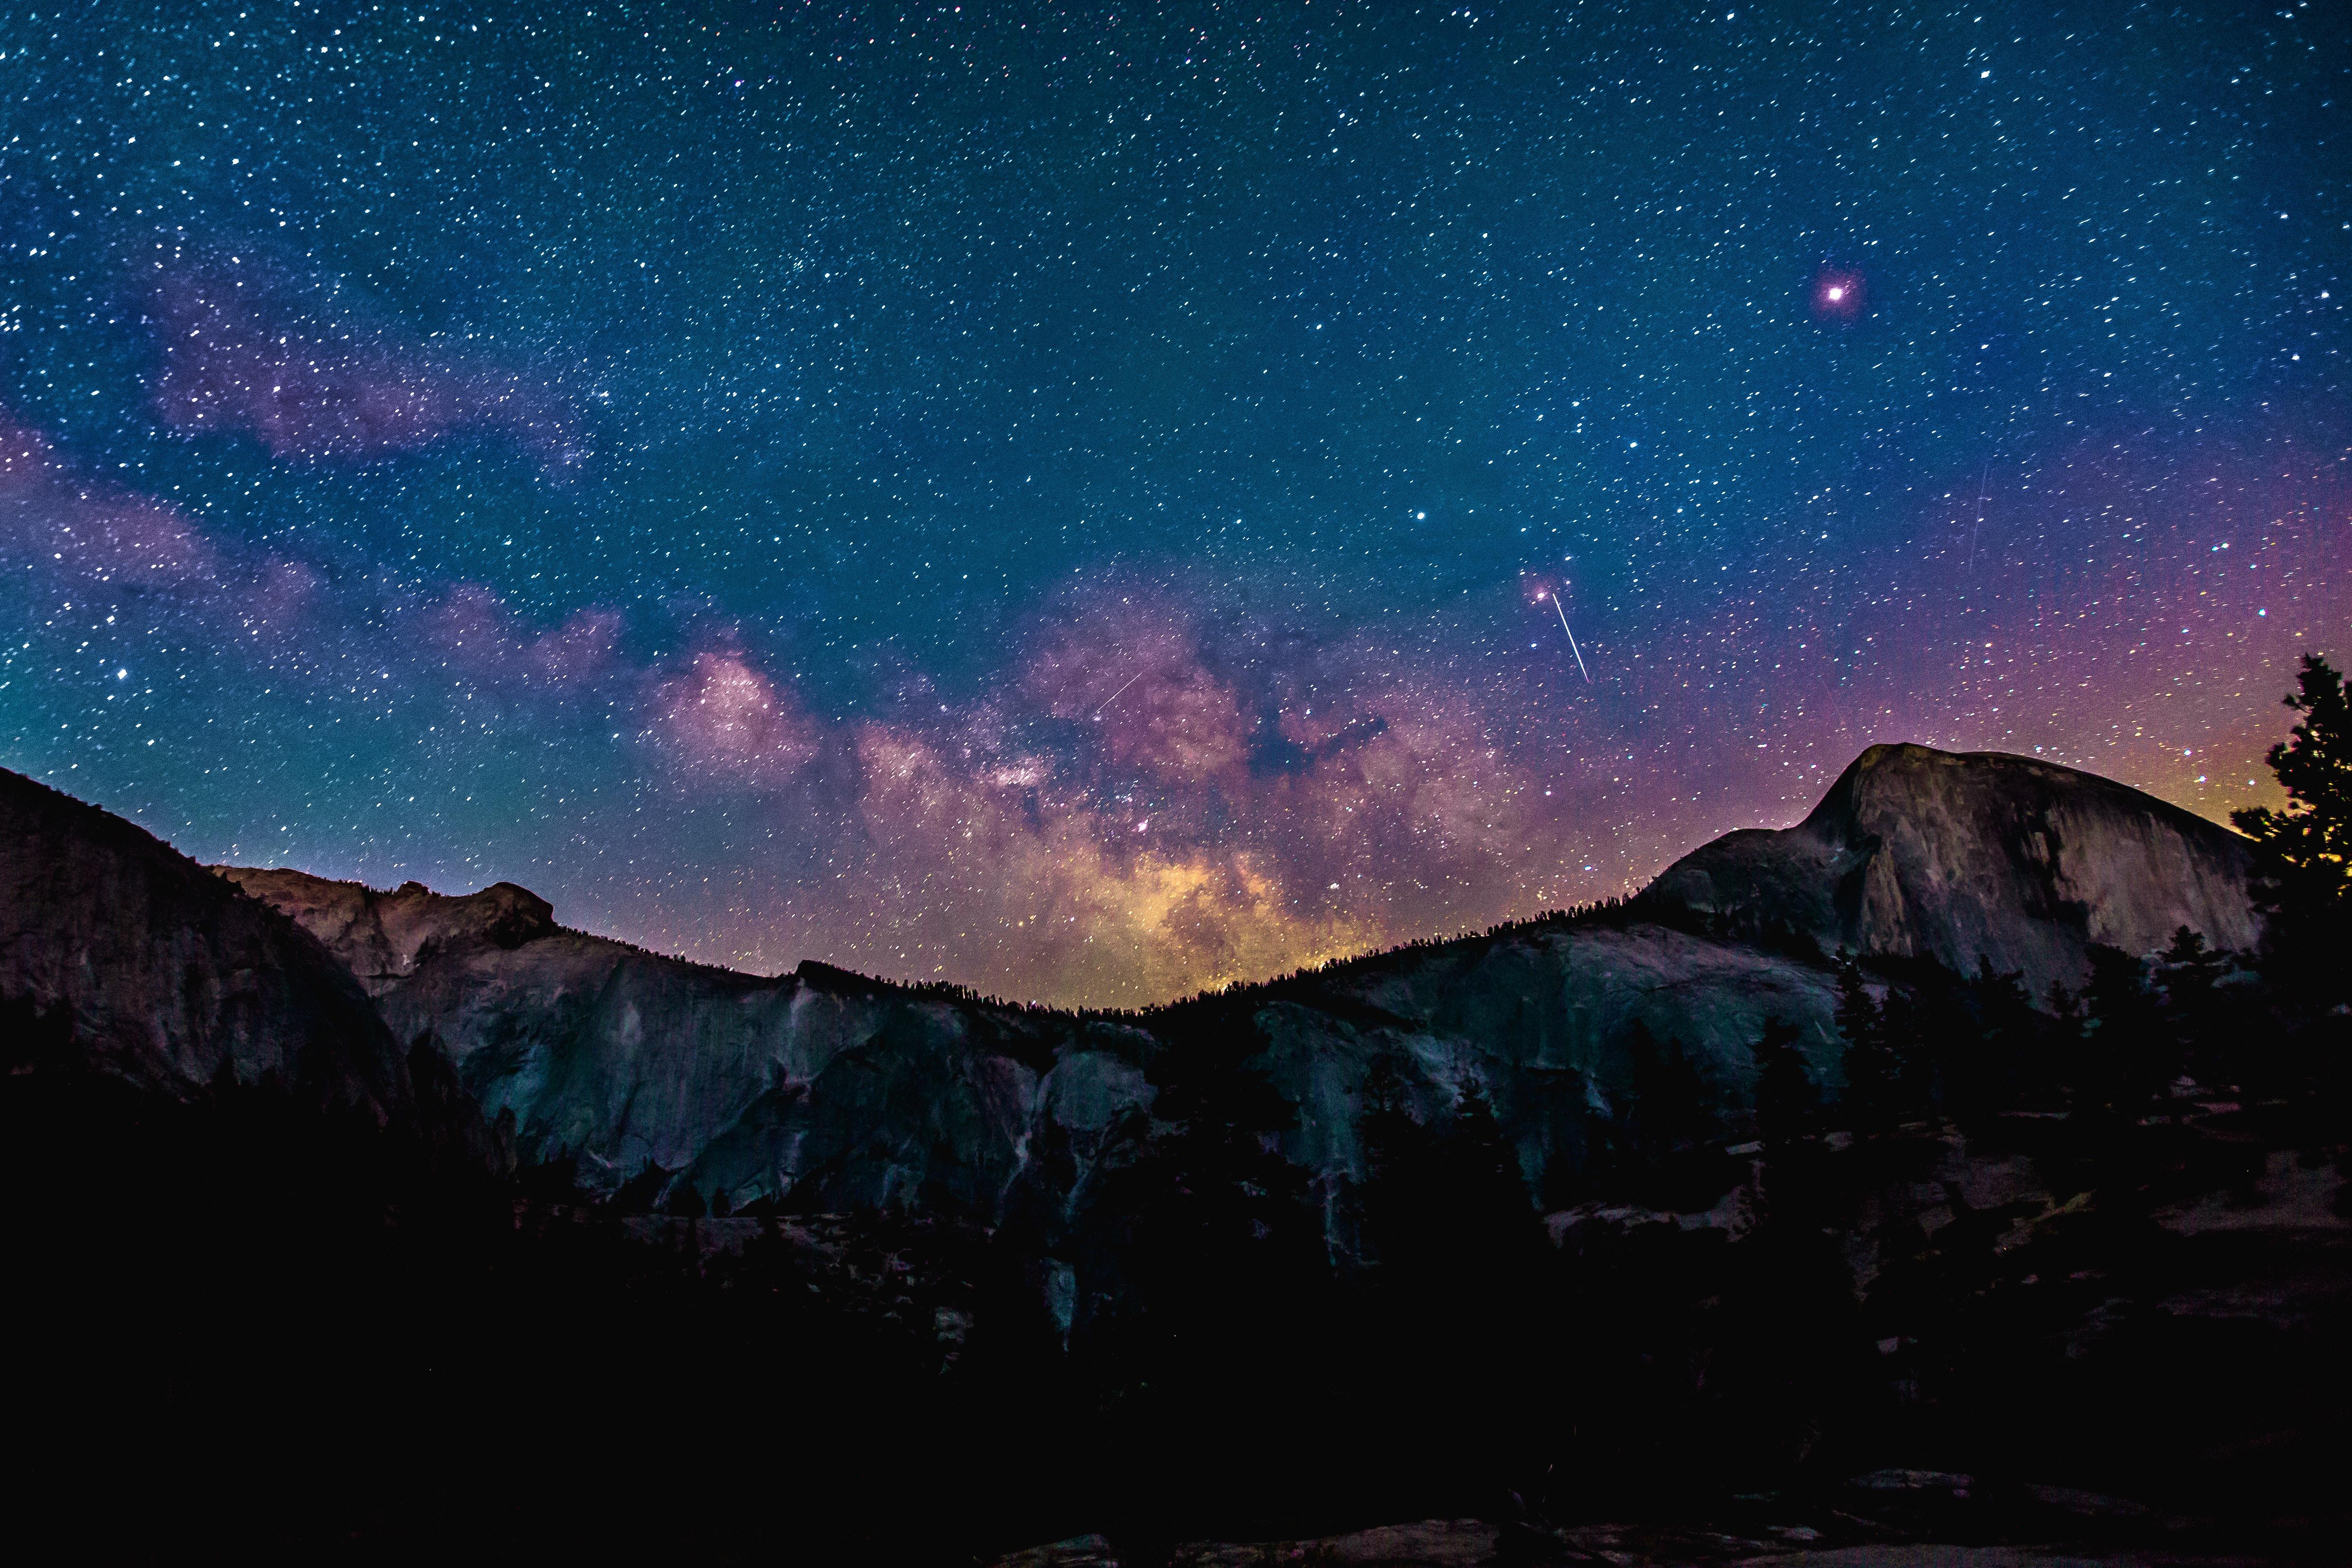 Shooting Star Milkway Galaxy Night Sky 4k, HD Nature, 4k ...